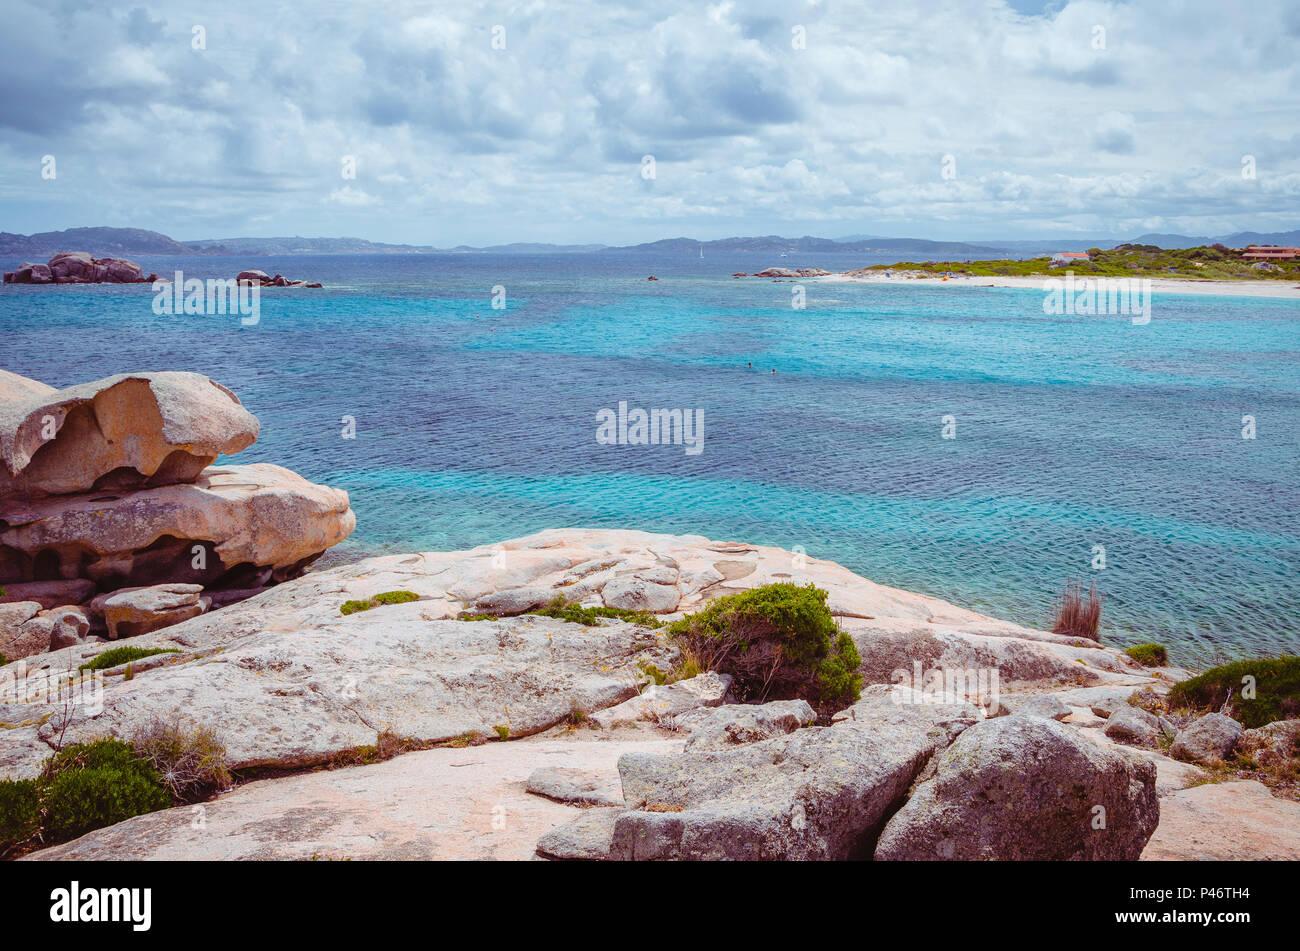 Bizarre granite rocks formation and clear azure sea on beautiful Sardinia island, Sargedna, Italy - Stock Image